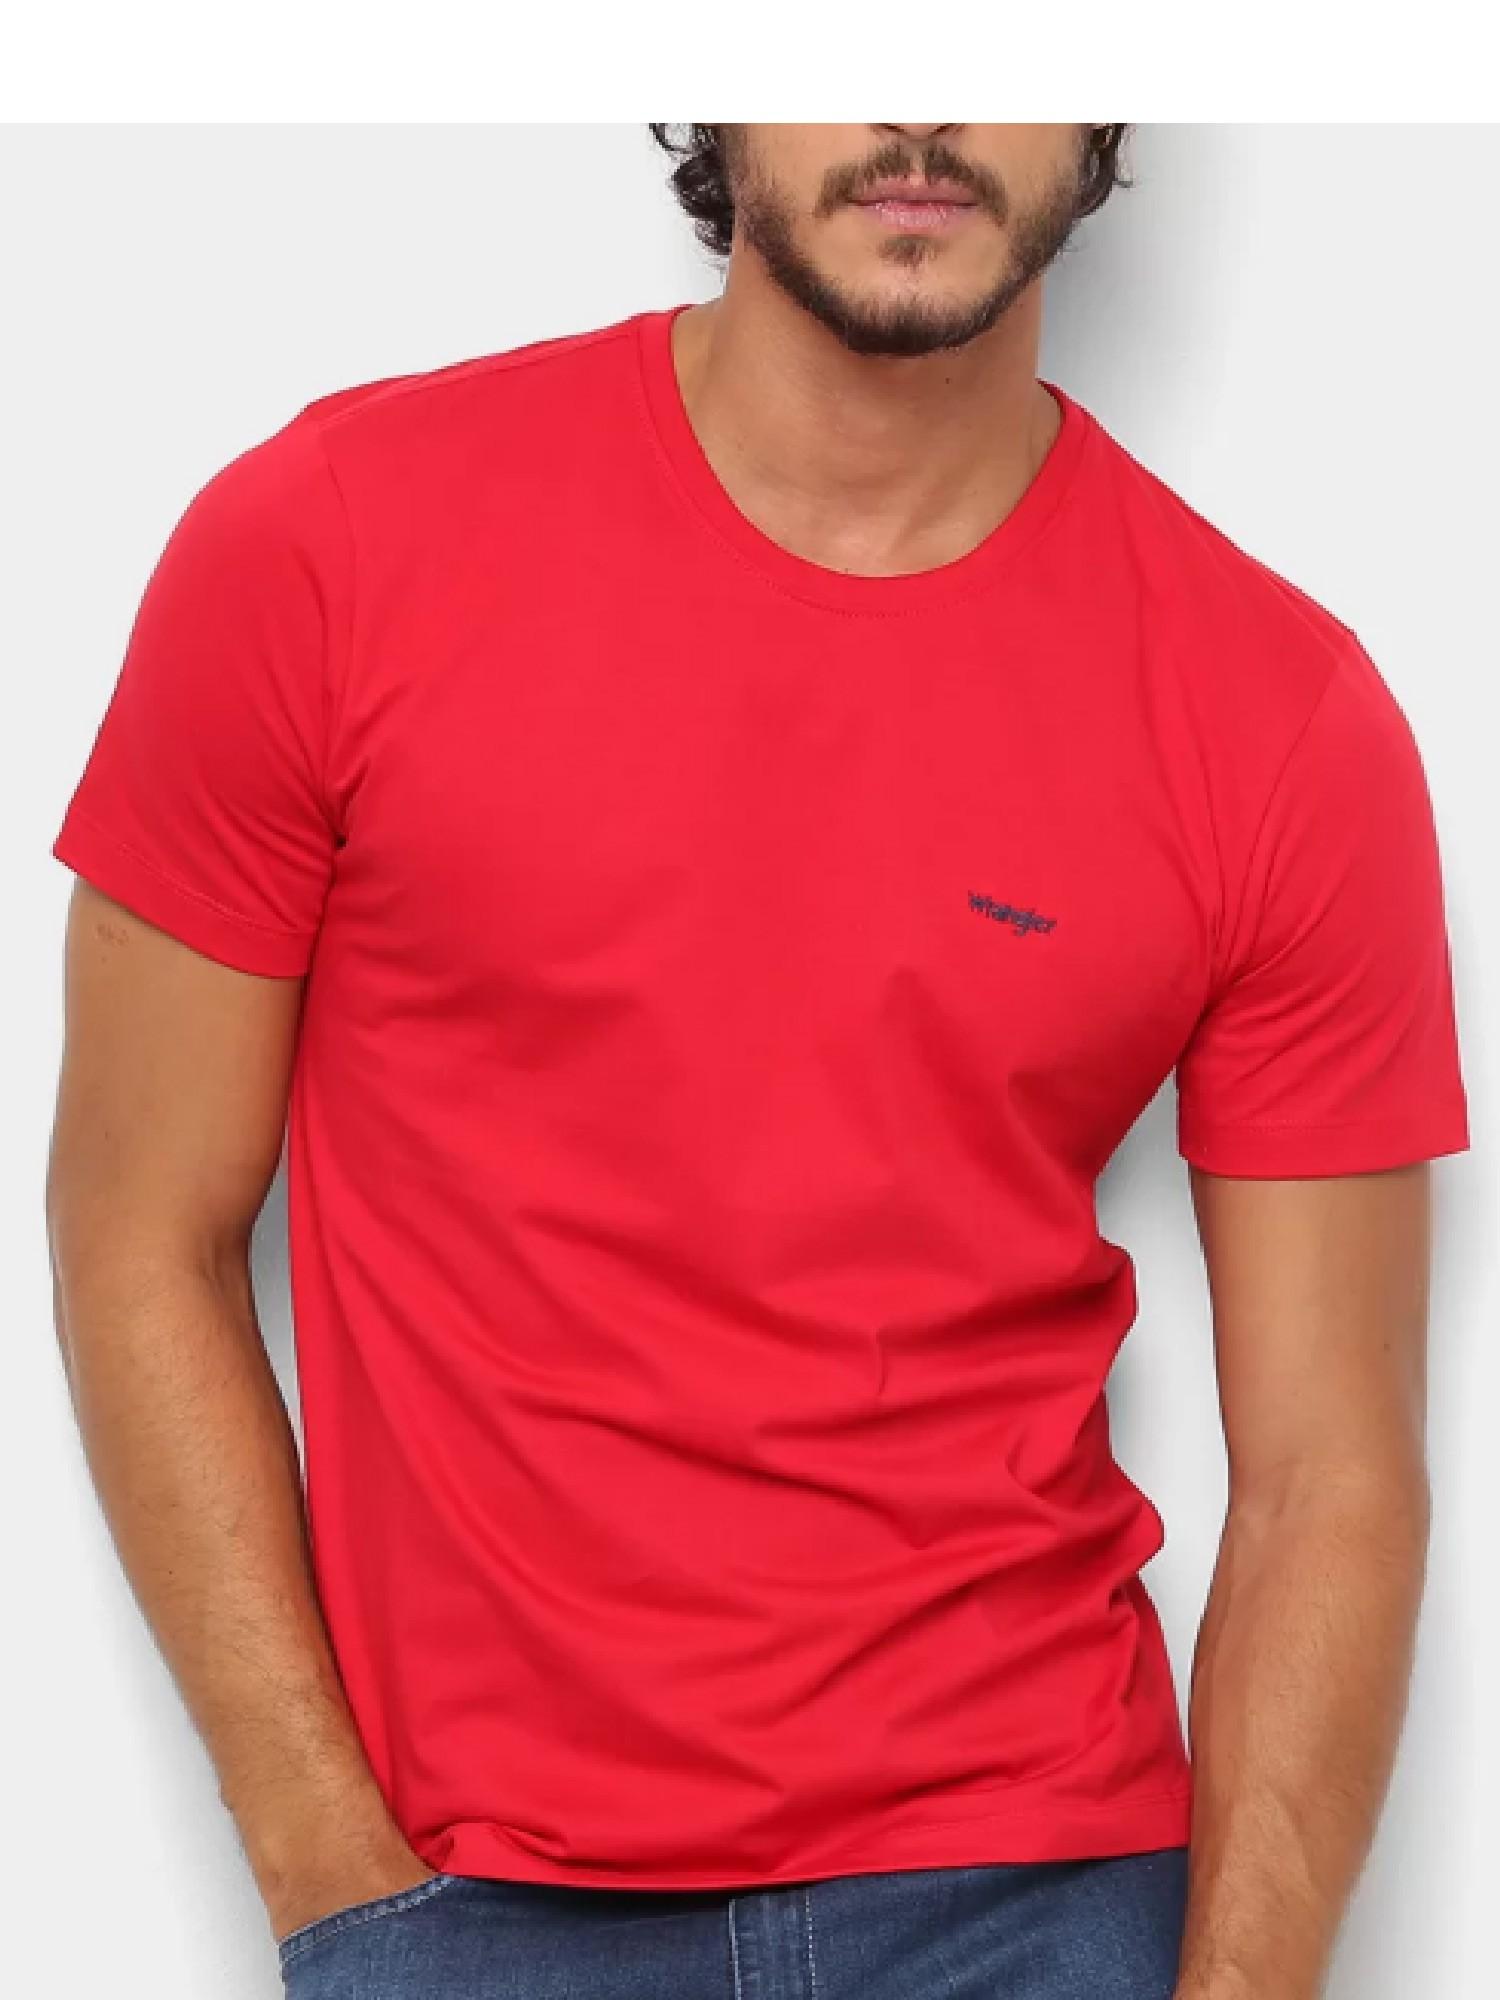 Camiseta Masculina Wrangler Vermelha Ref. WM58521VM